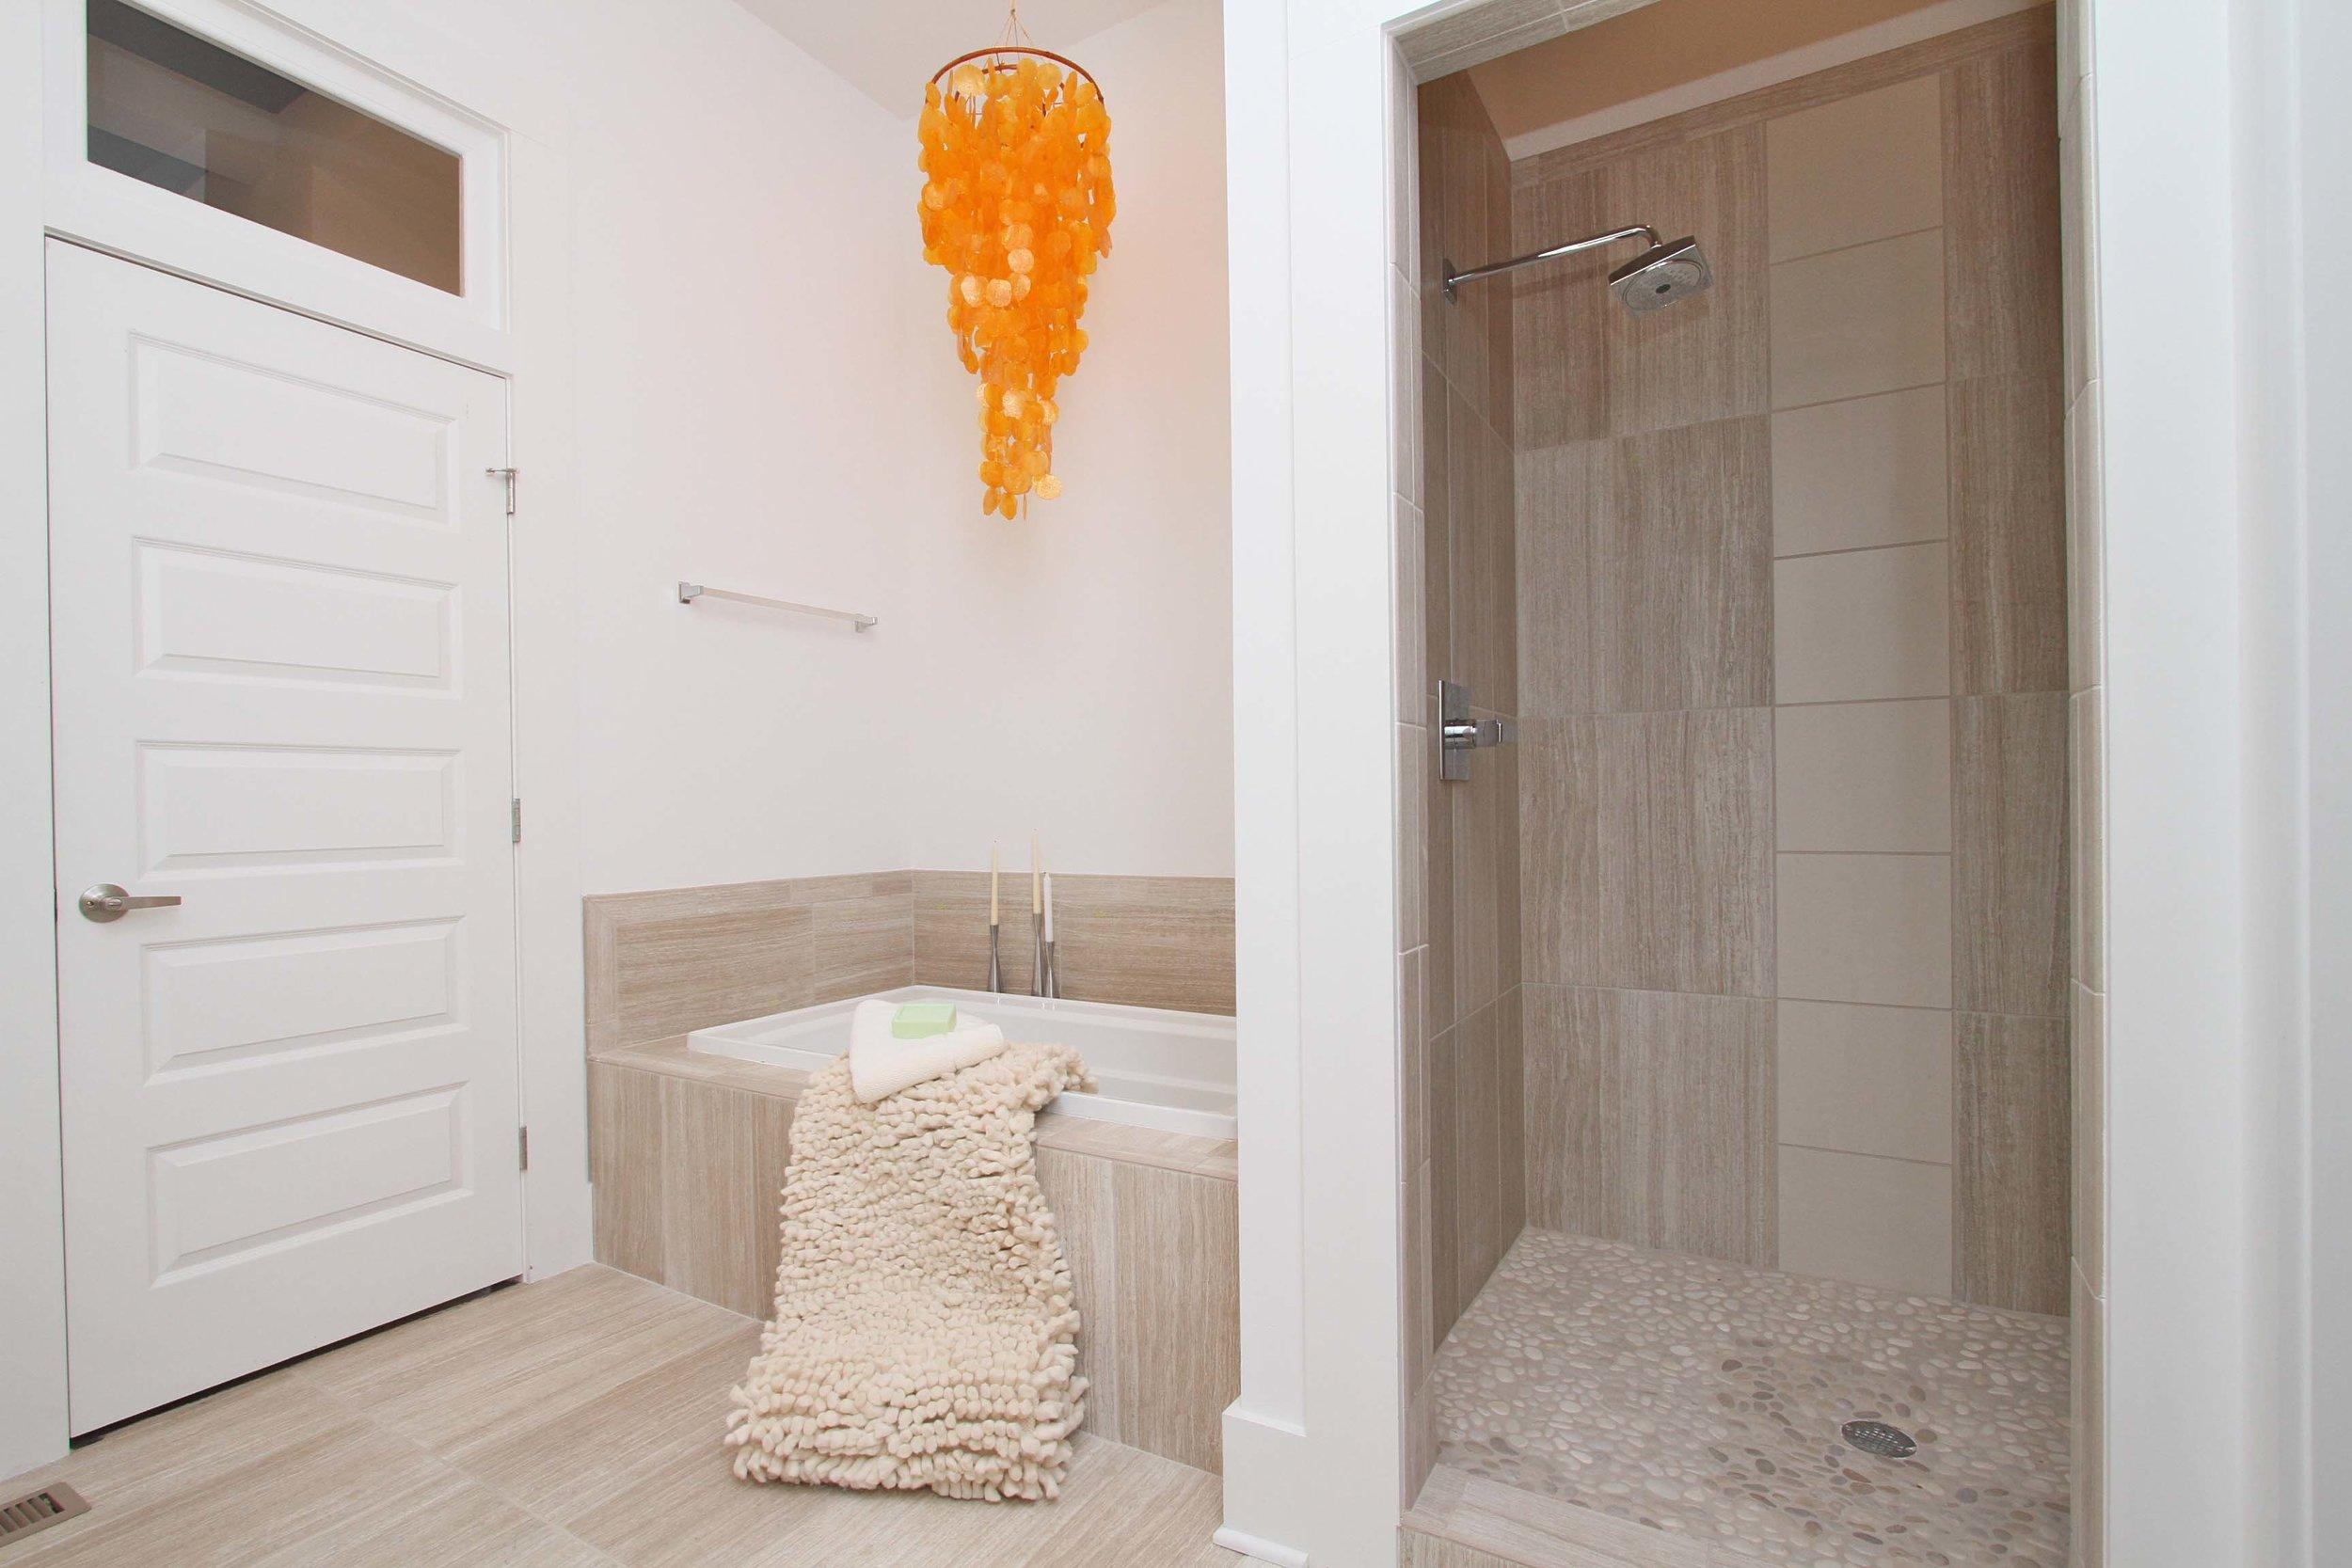 House-Plans-Online-Craftsman-Nashville-Peggy-Newman-Benton-Steam-Shower-Master-Tub.jpg